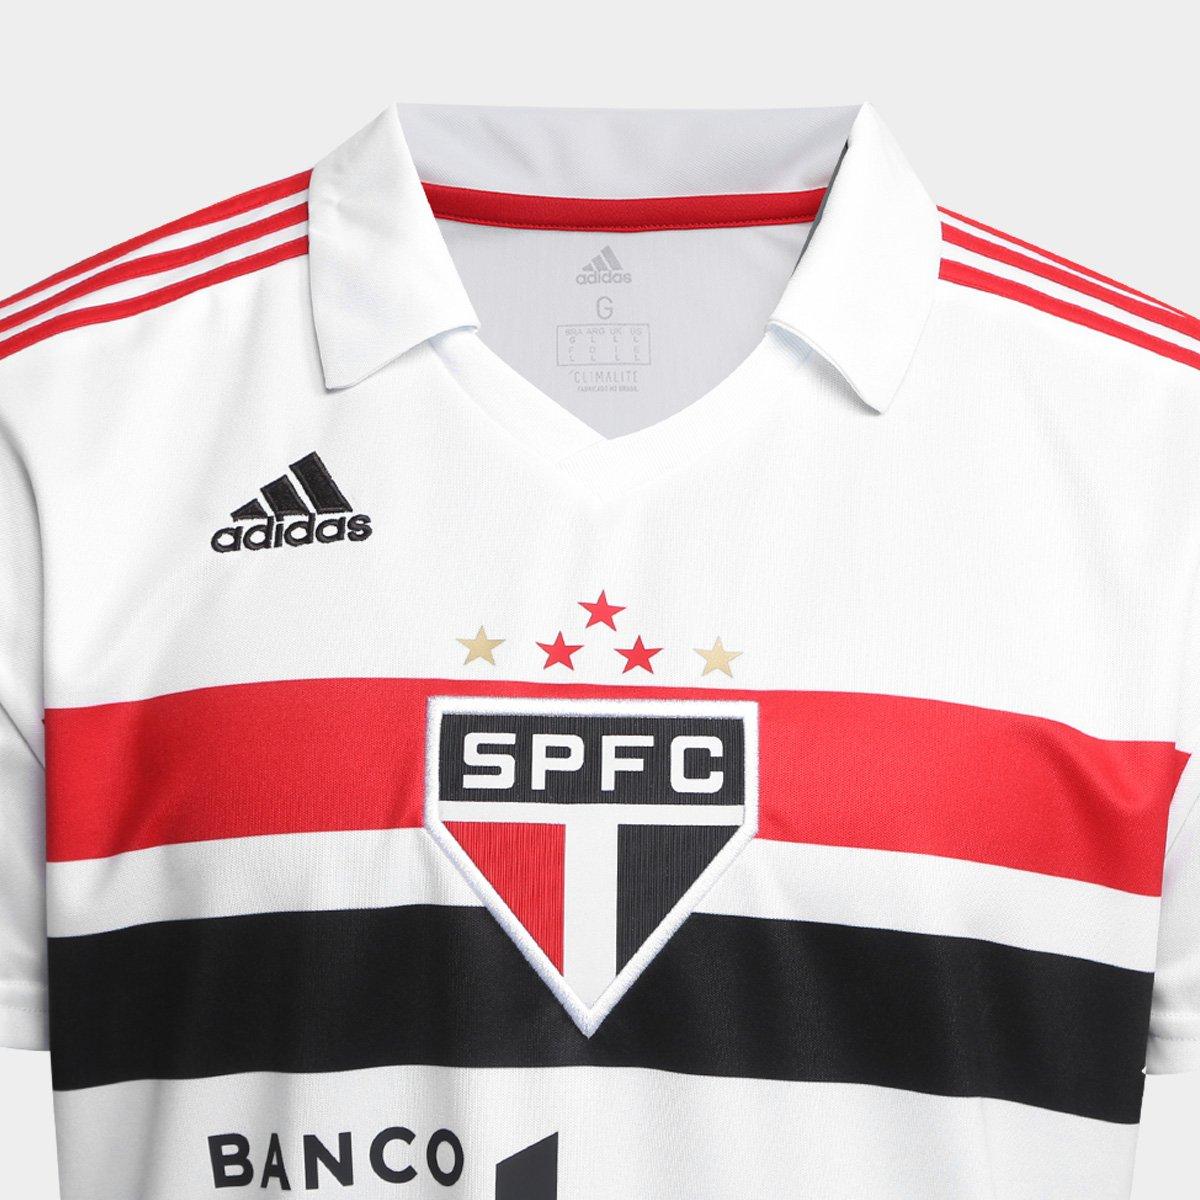 ebc22c5c3b Camisa São Paulo I 2018 s n° Torcedor Adidas Masculina - Branco e ...